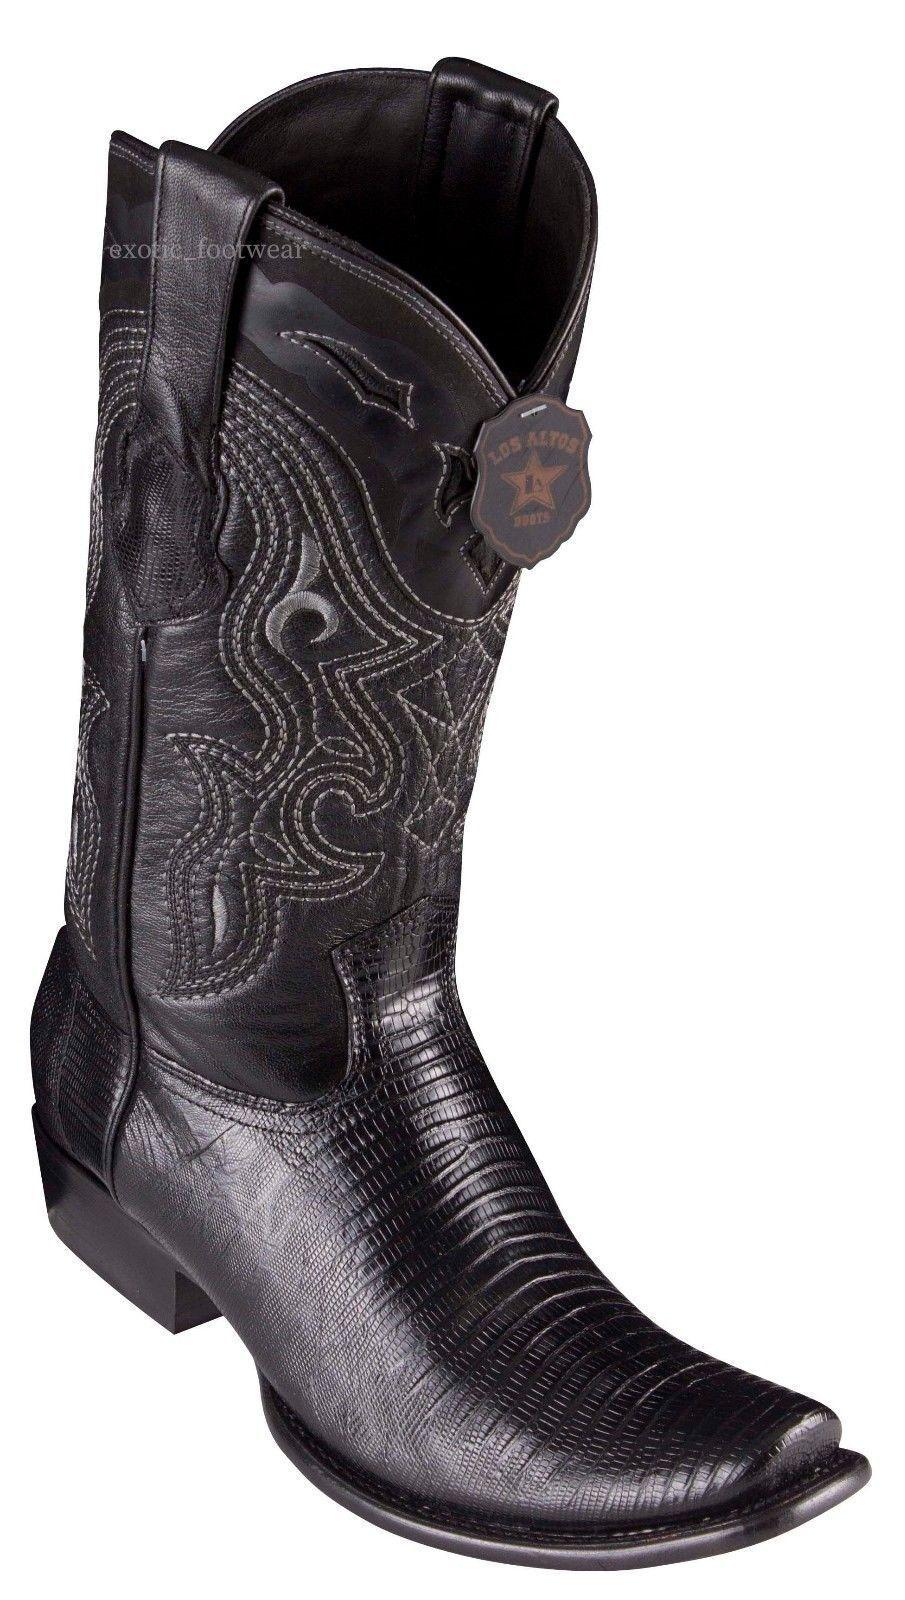 King Exotic BLACK Genuine TEJU LIZARD Western Boot Dubai Square Toe D